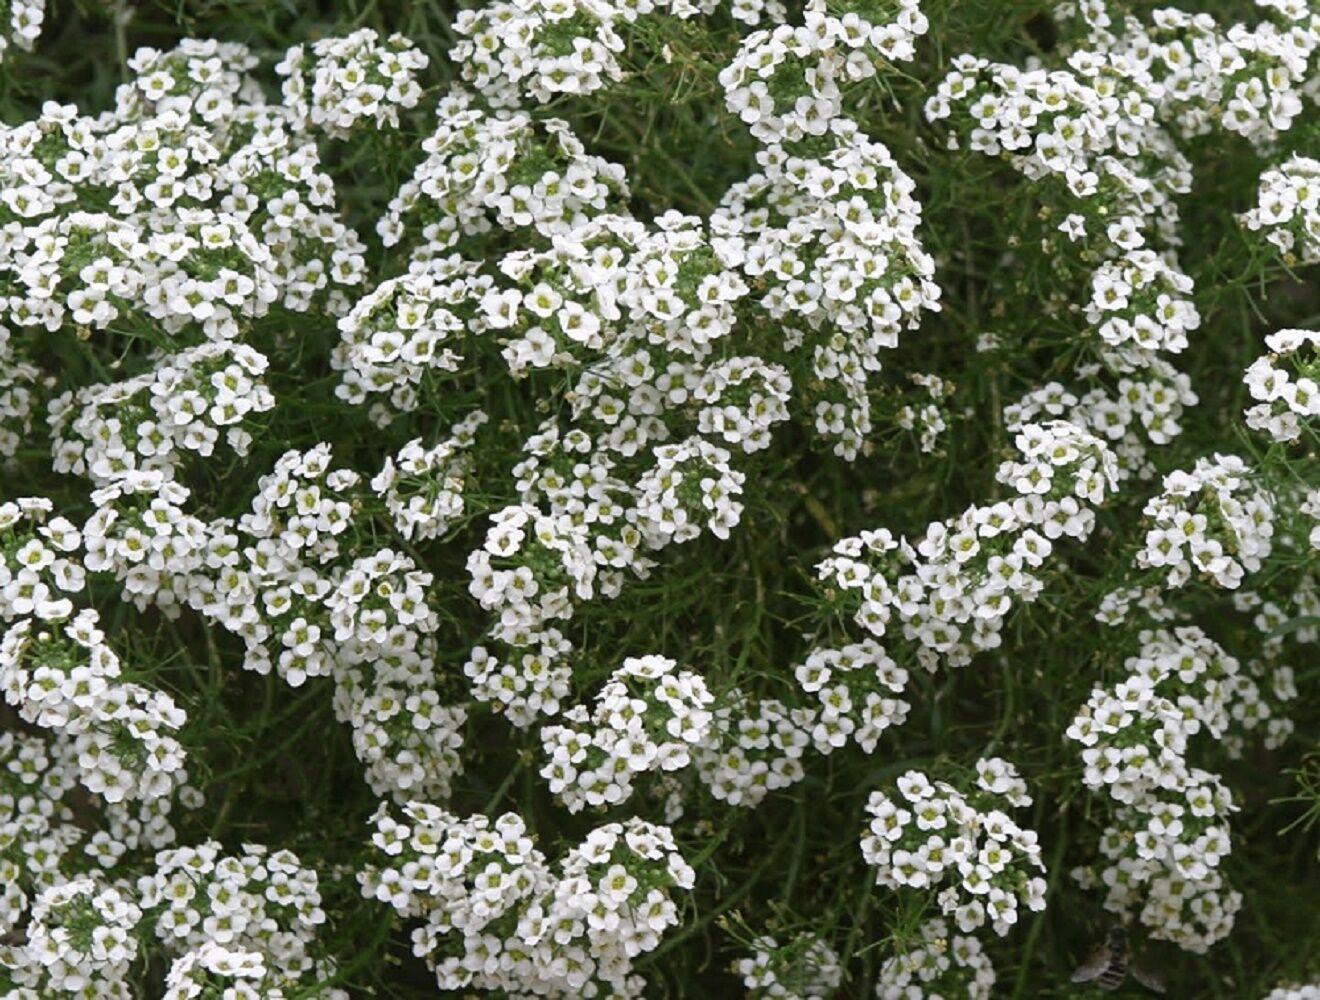 25 grams Alyssum Snowcloth lobularia maritima 57,000 seeds Bulk